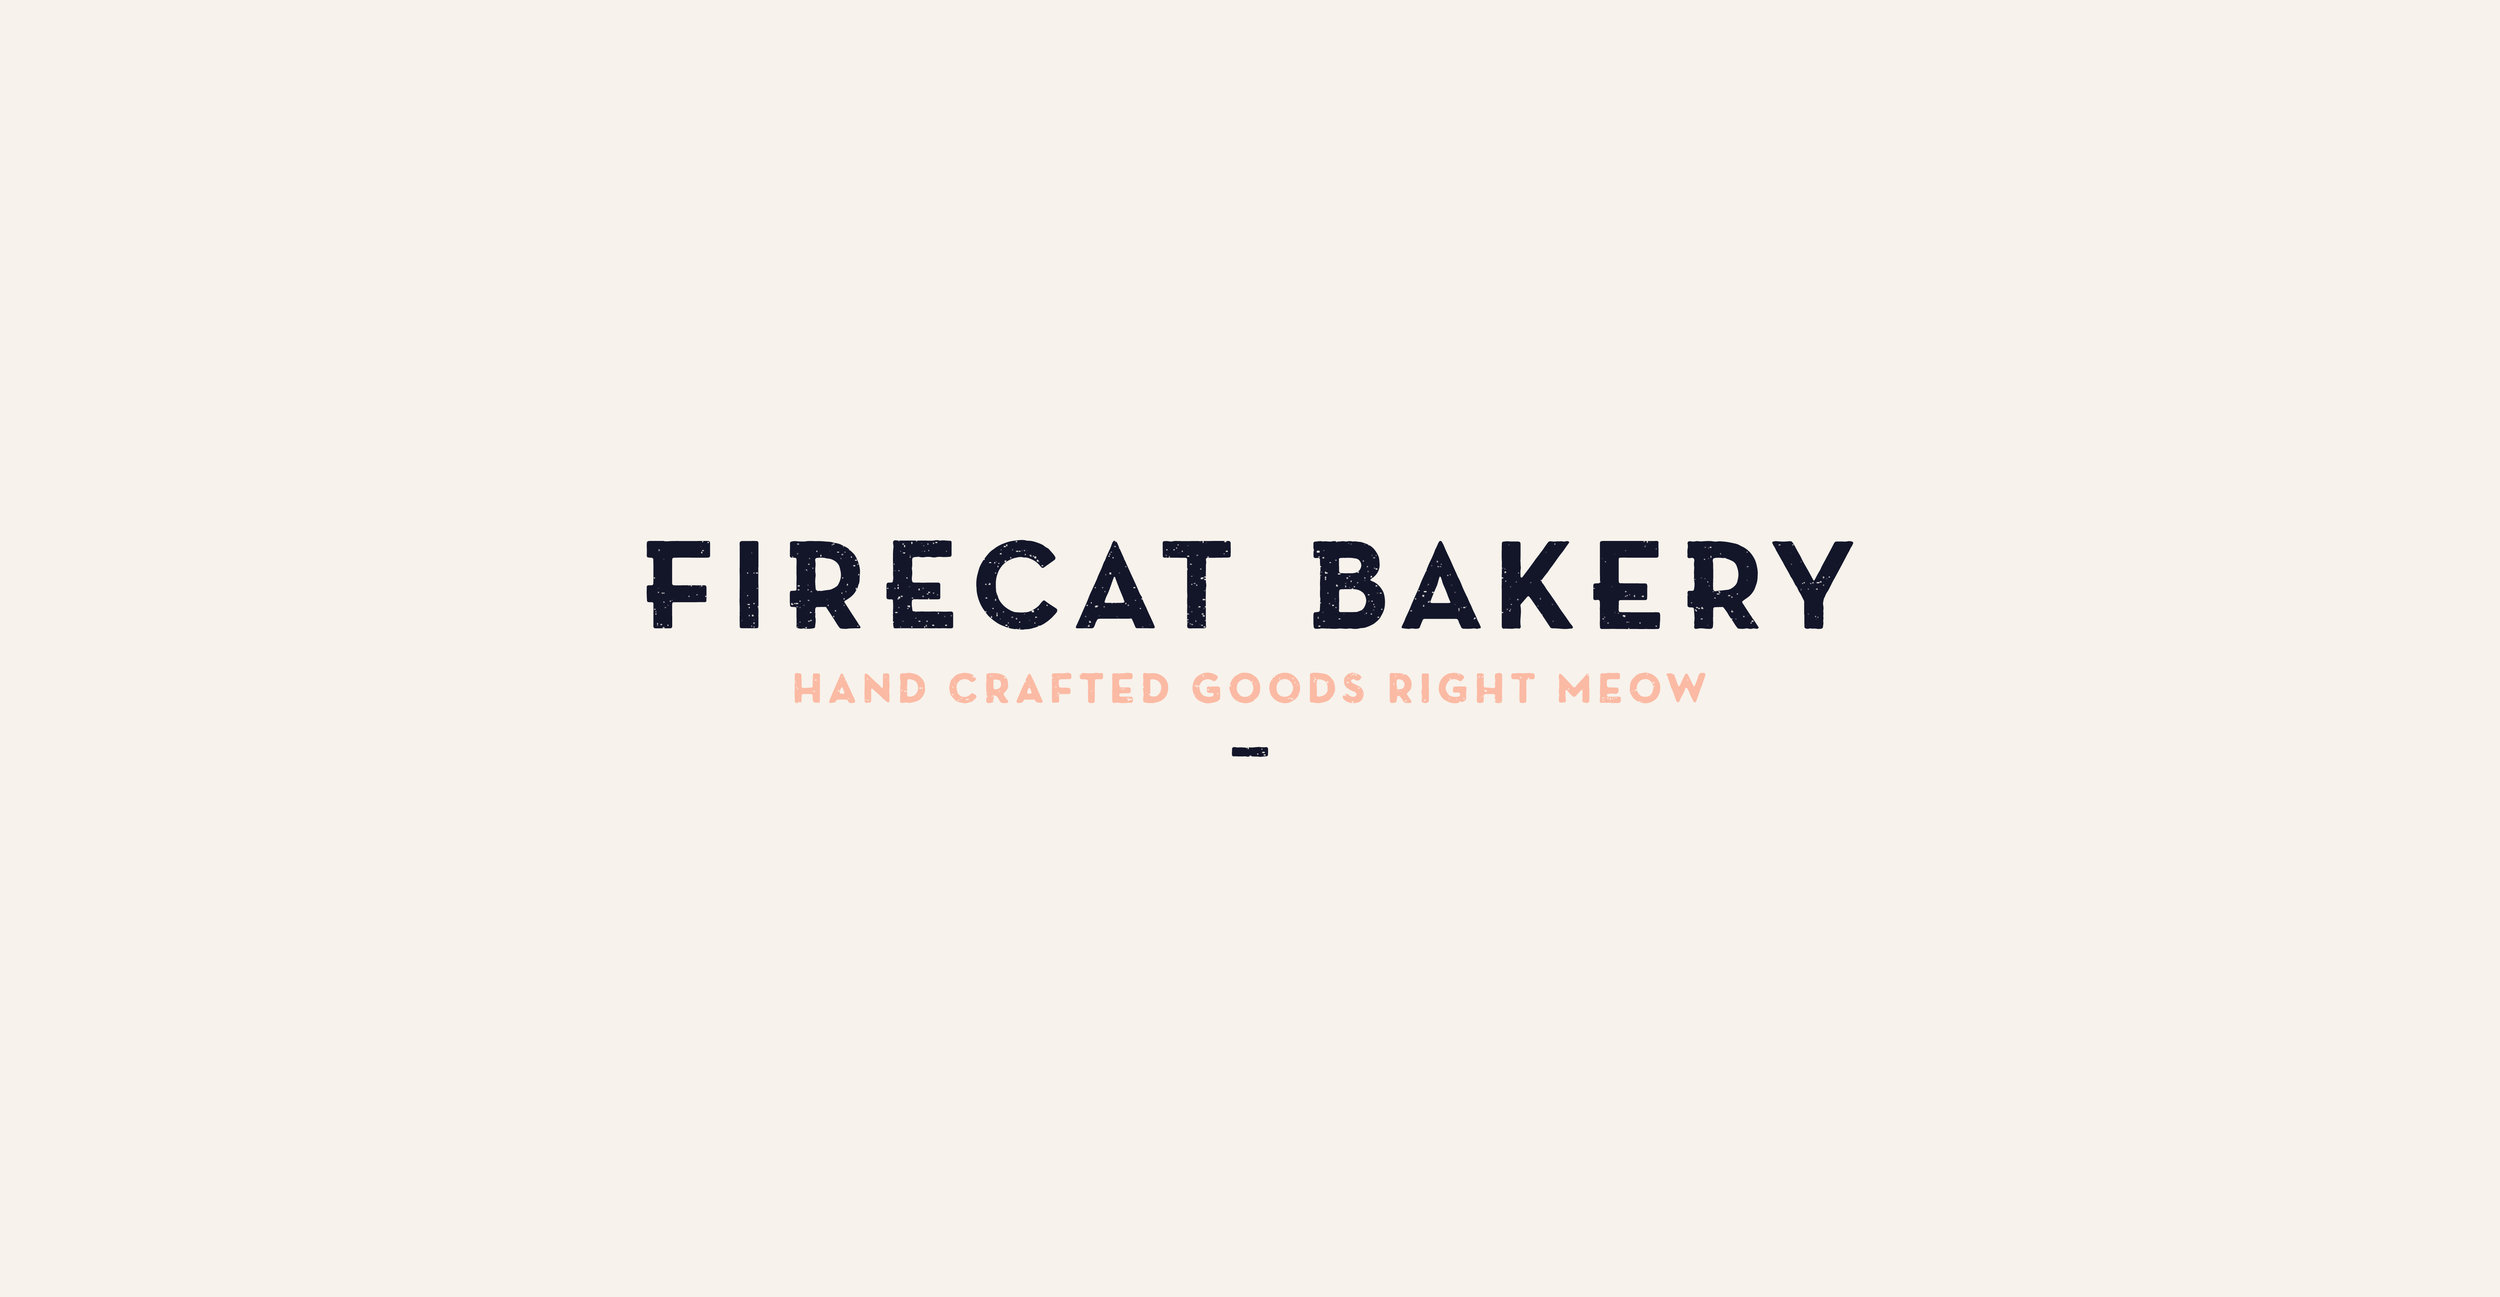 Website_Firecat_Bakery_1-07.jpg